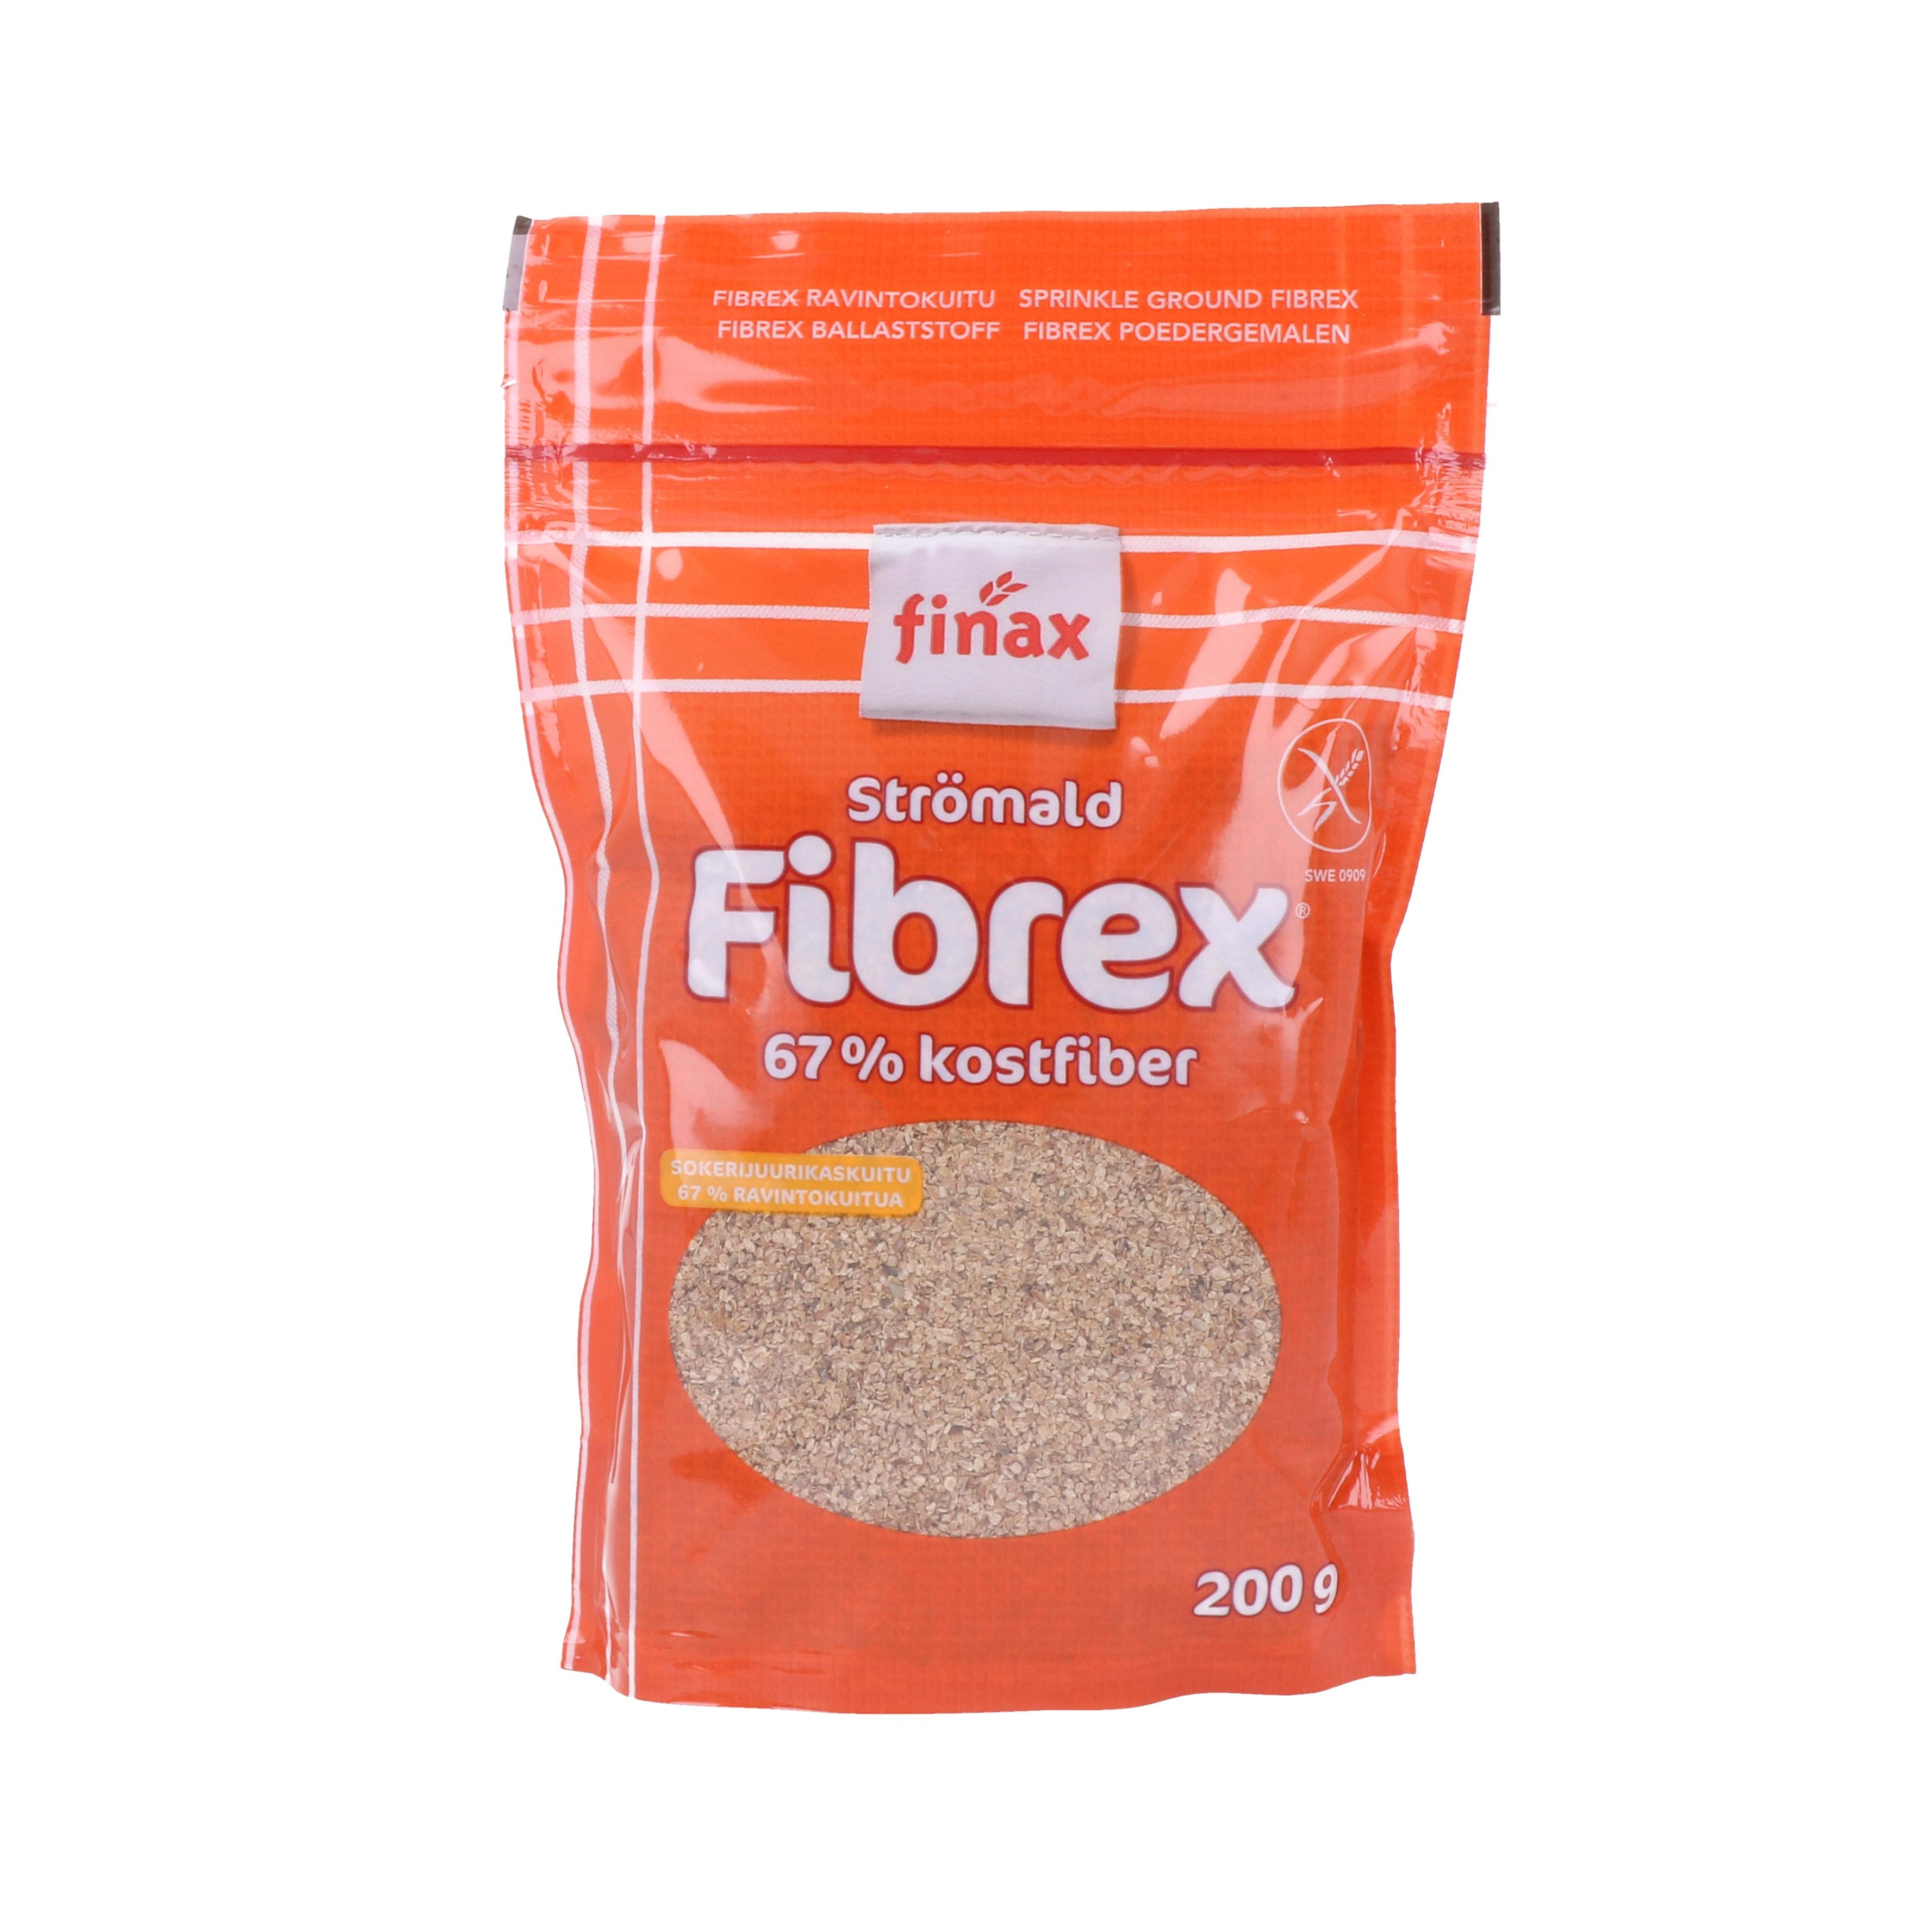 Finax Fibrex 200g